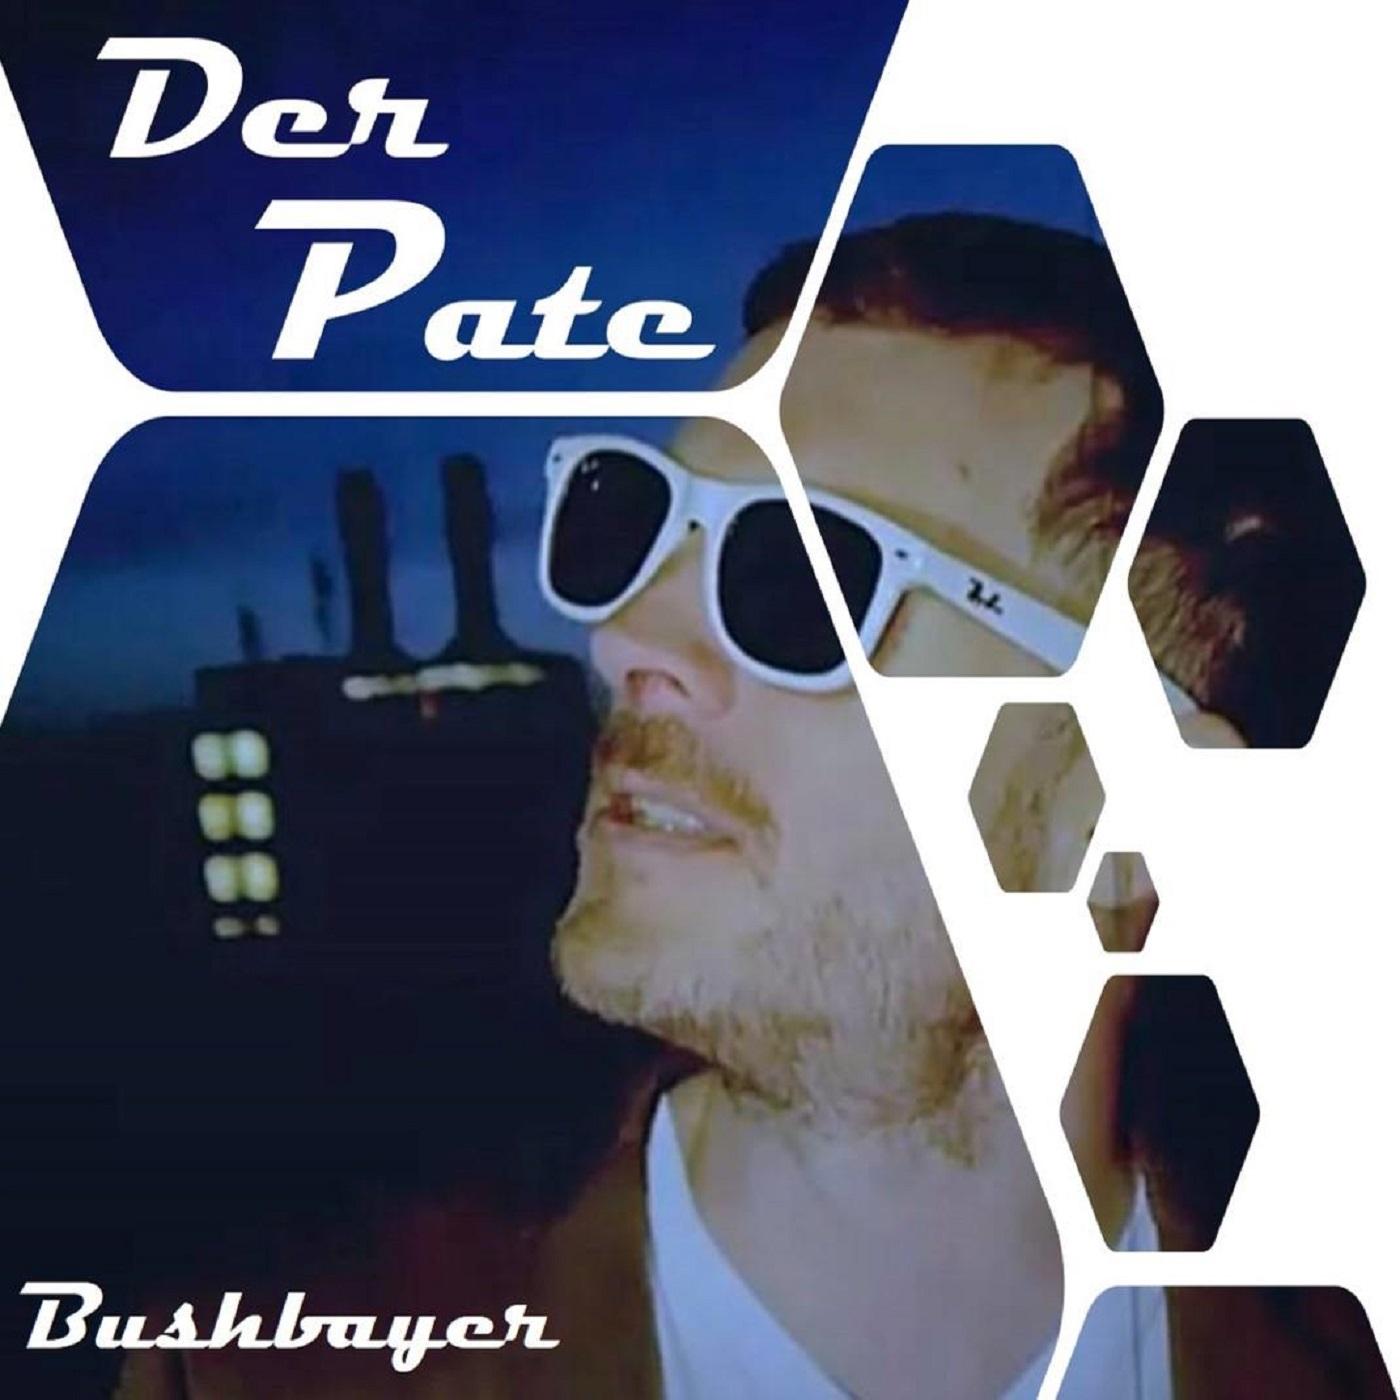 Upcoming: Bushbayer - Der Pate